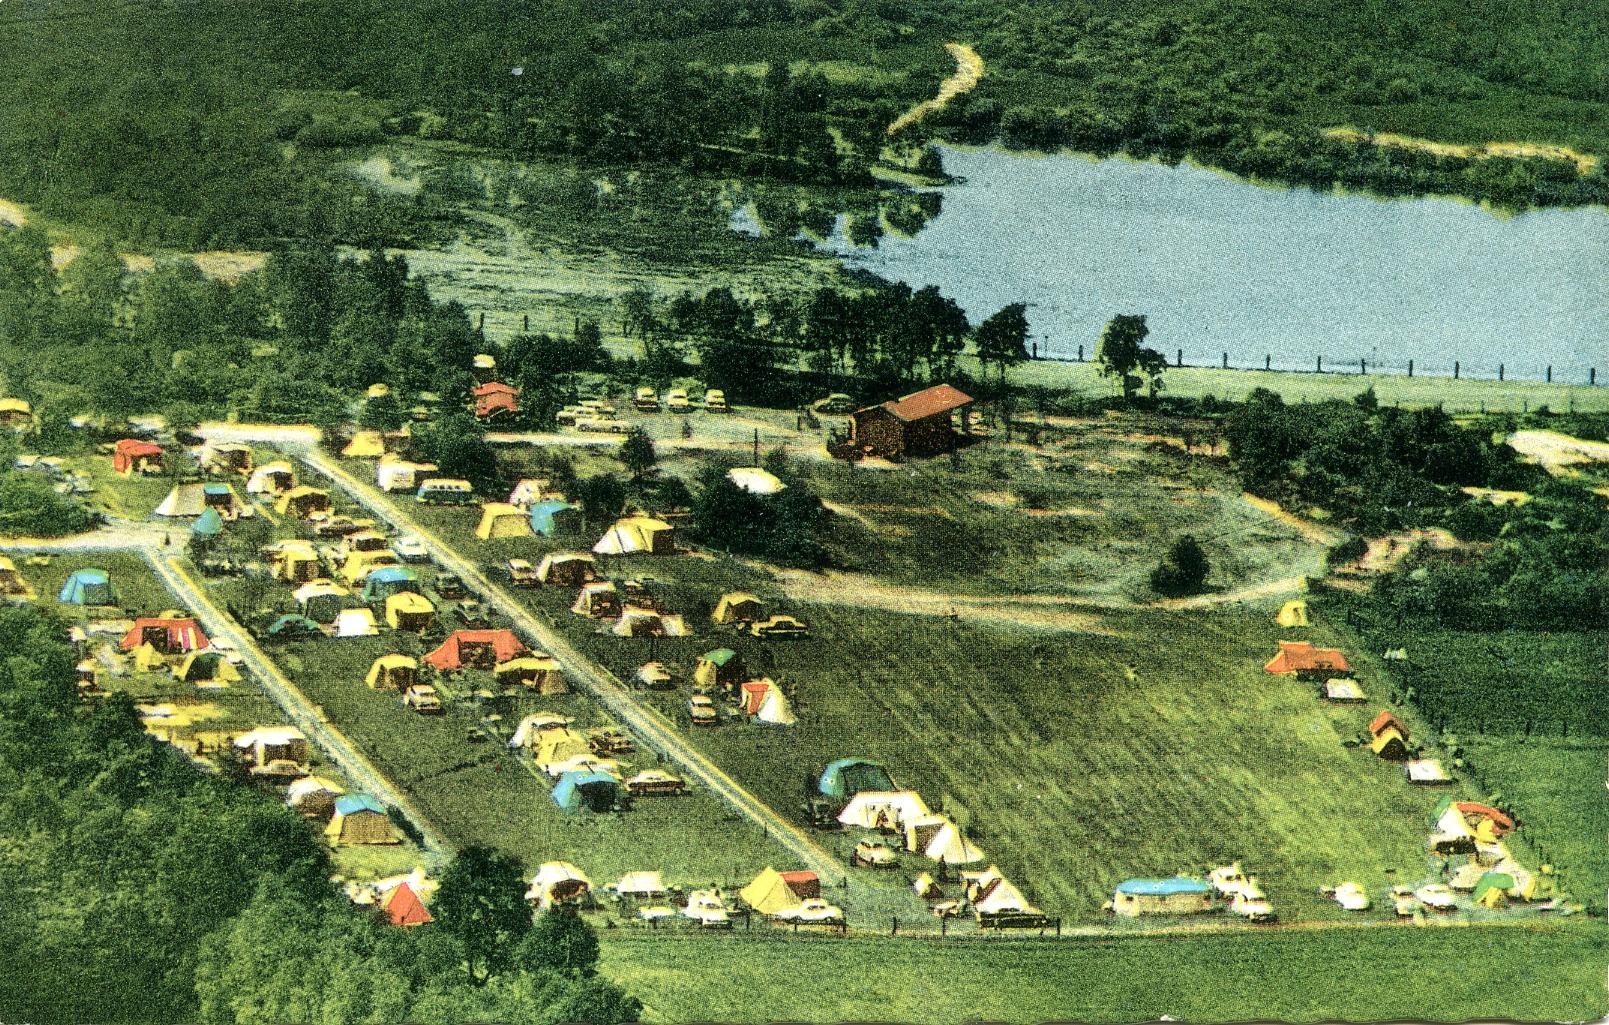 Campingplatz Gahlen-Hardt